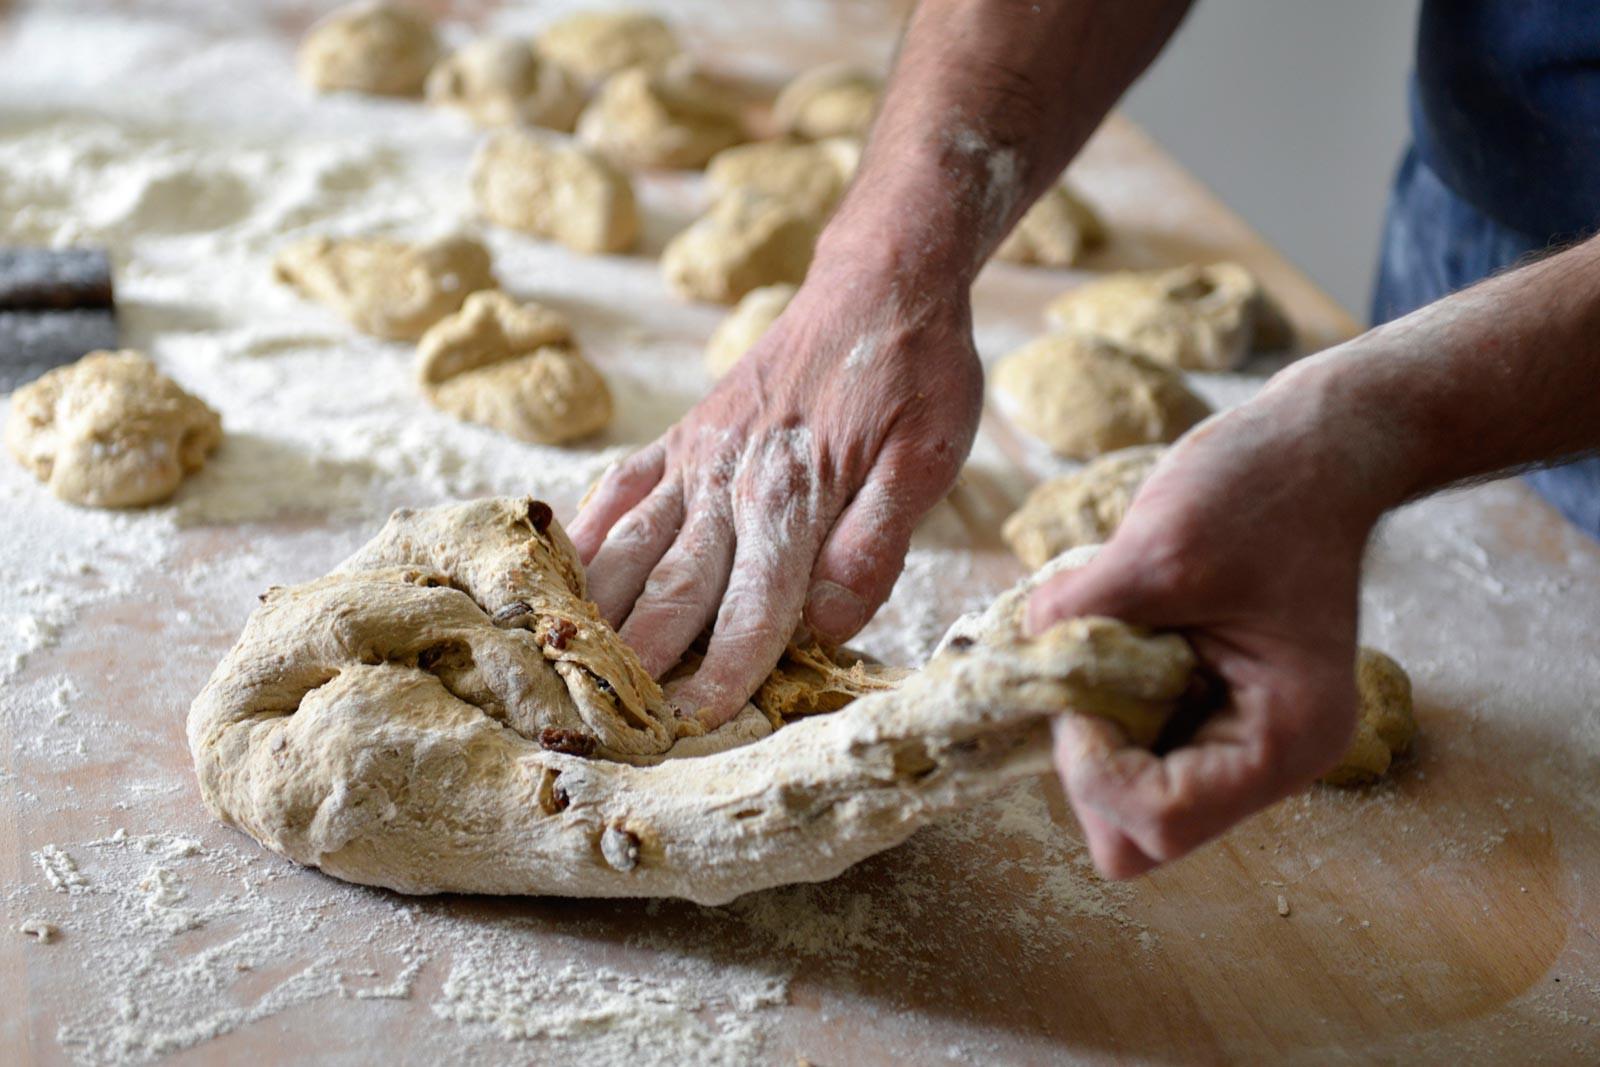 wm-baking-1-1600.jpg